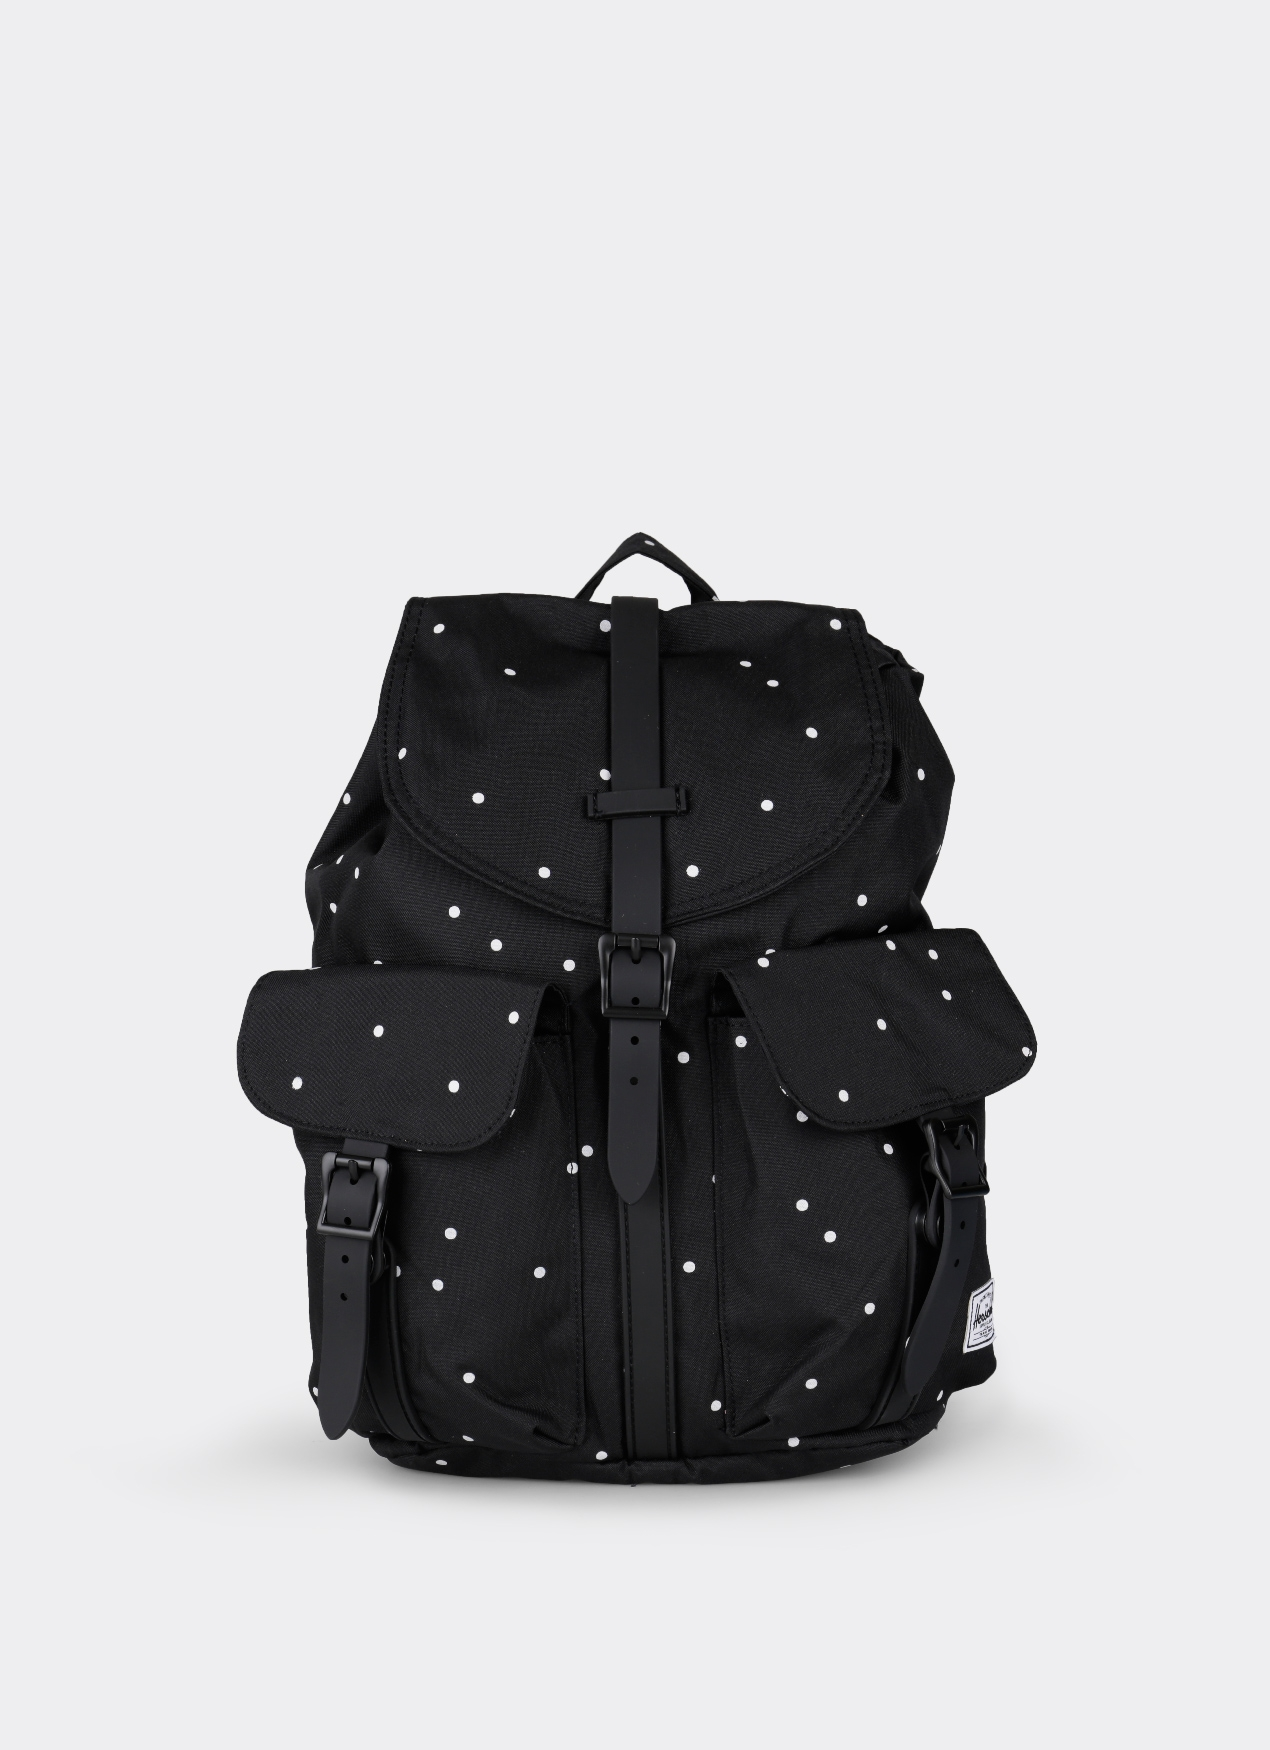 Herschel Supply Co Dawson Black Rubber Polkadot Backpack